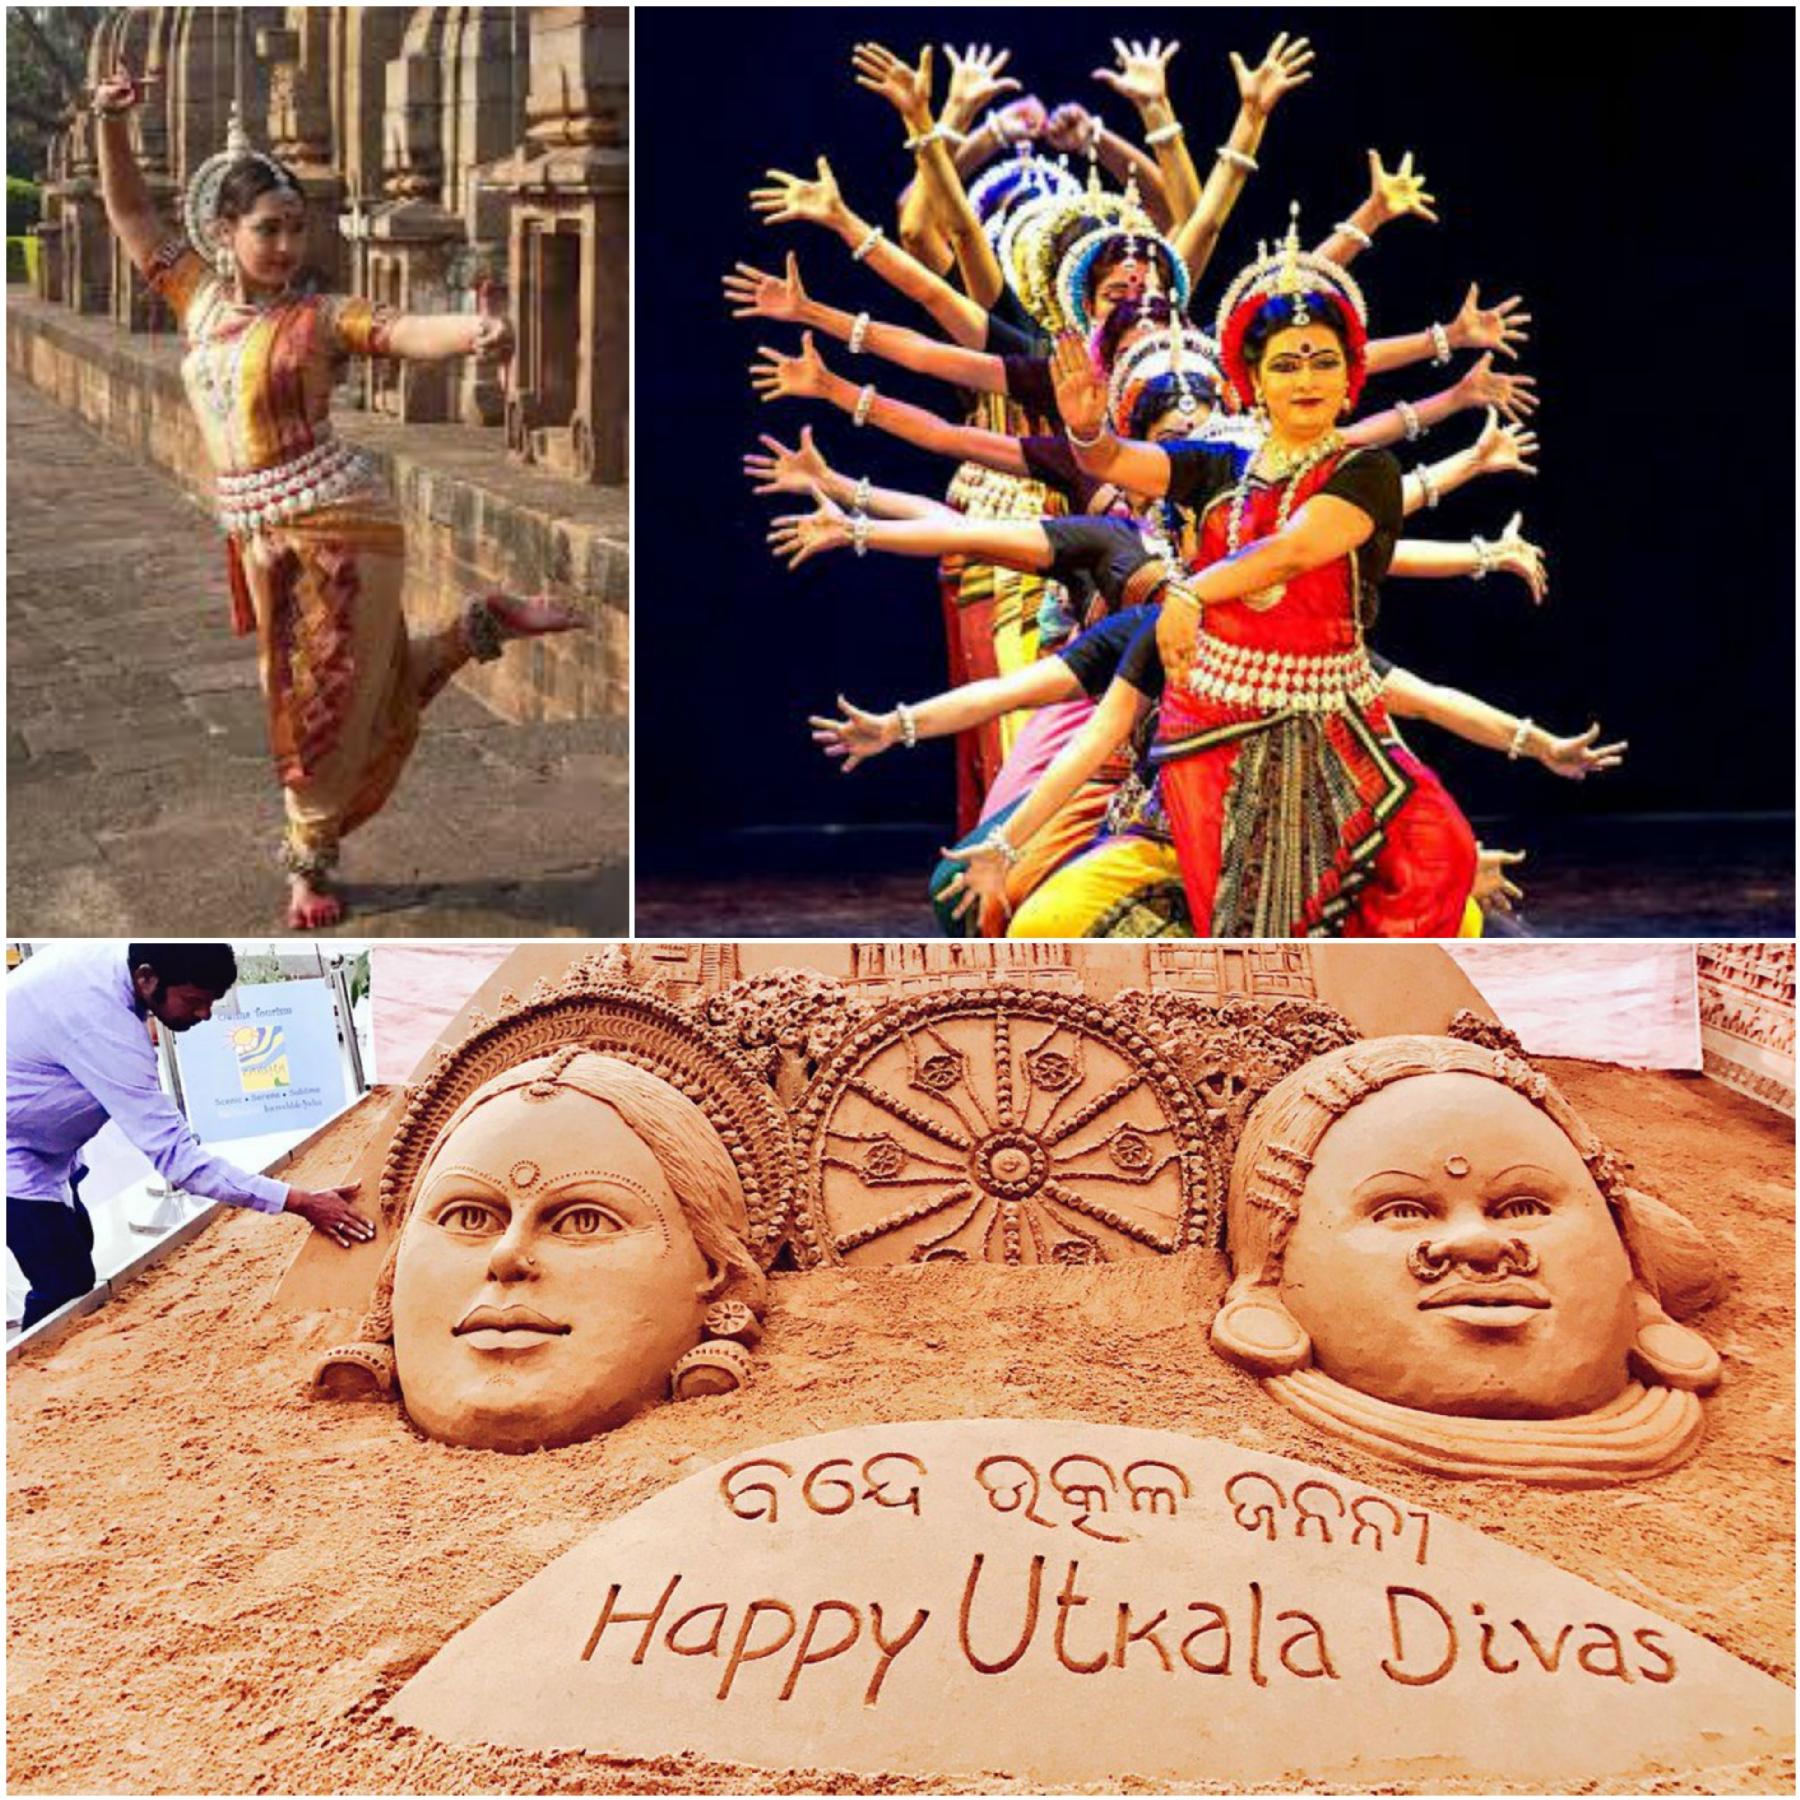 Happy Birthday to Odisha as people are celebrating its 81st 'Utkala Diwas'